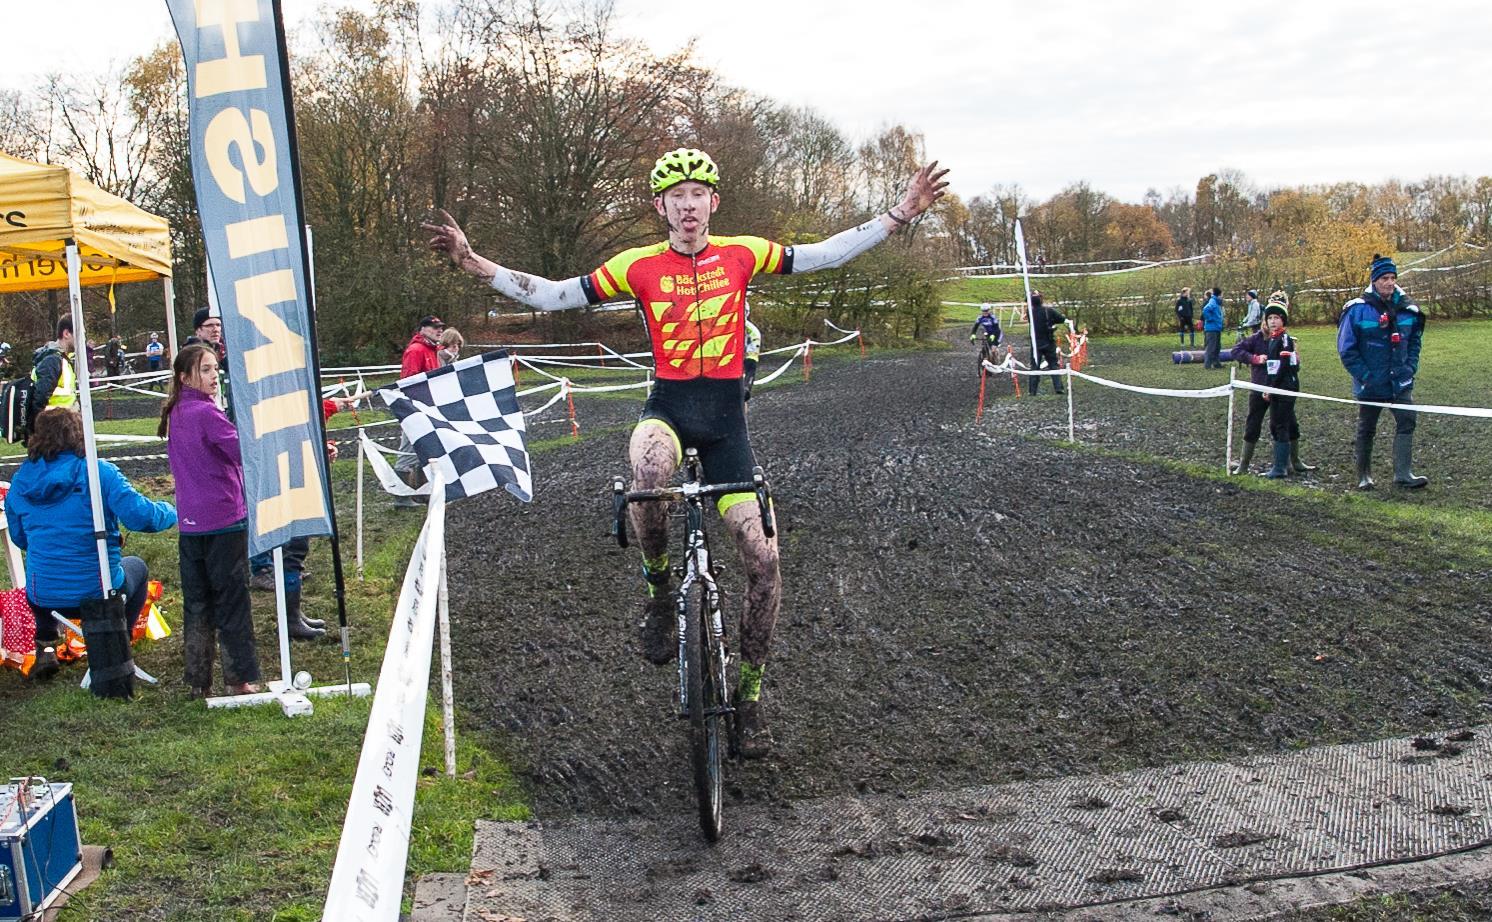 West Midlands Cyclo-Cross League